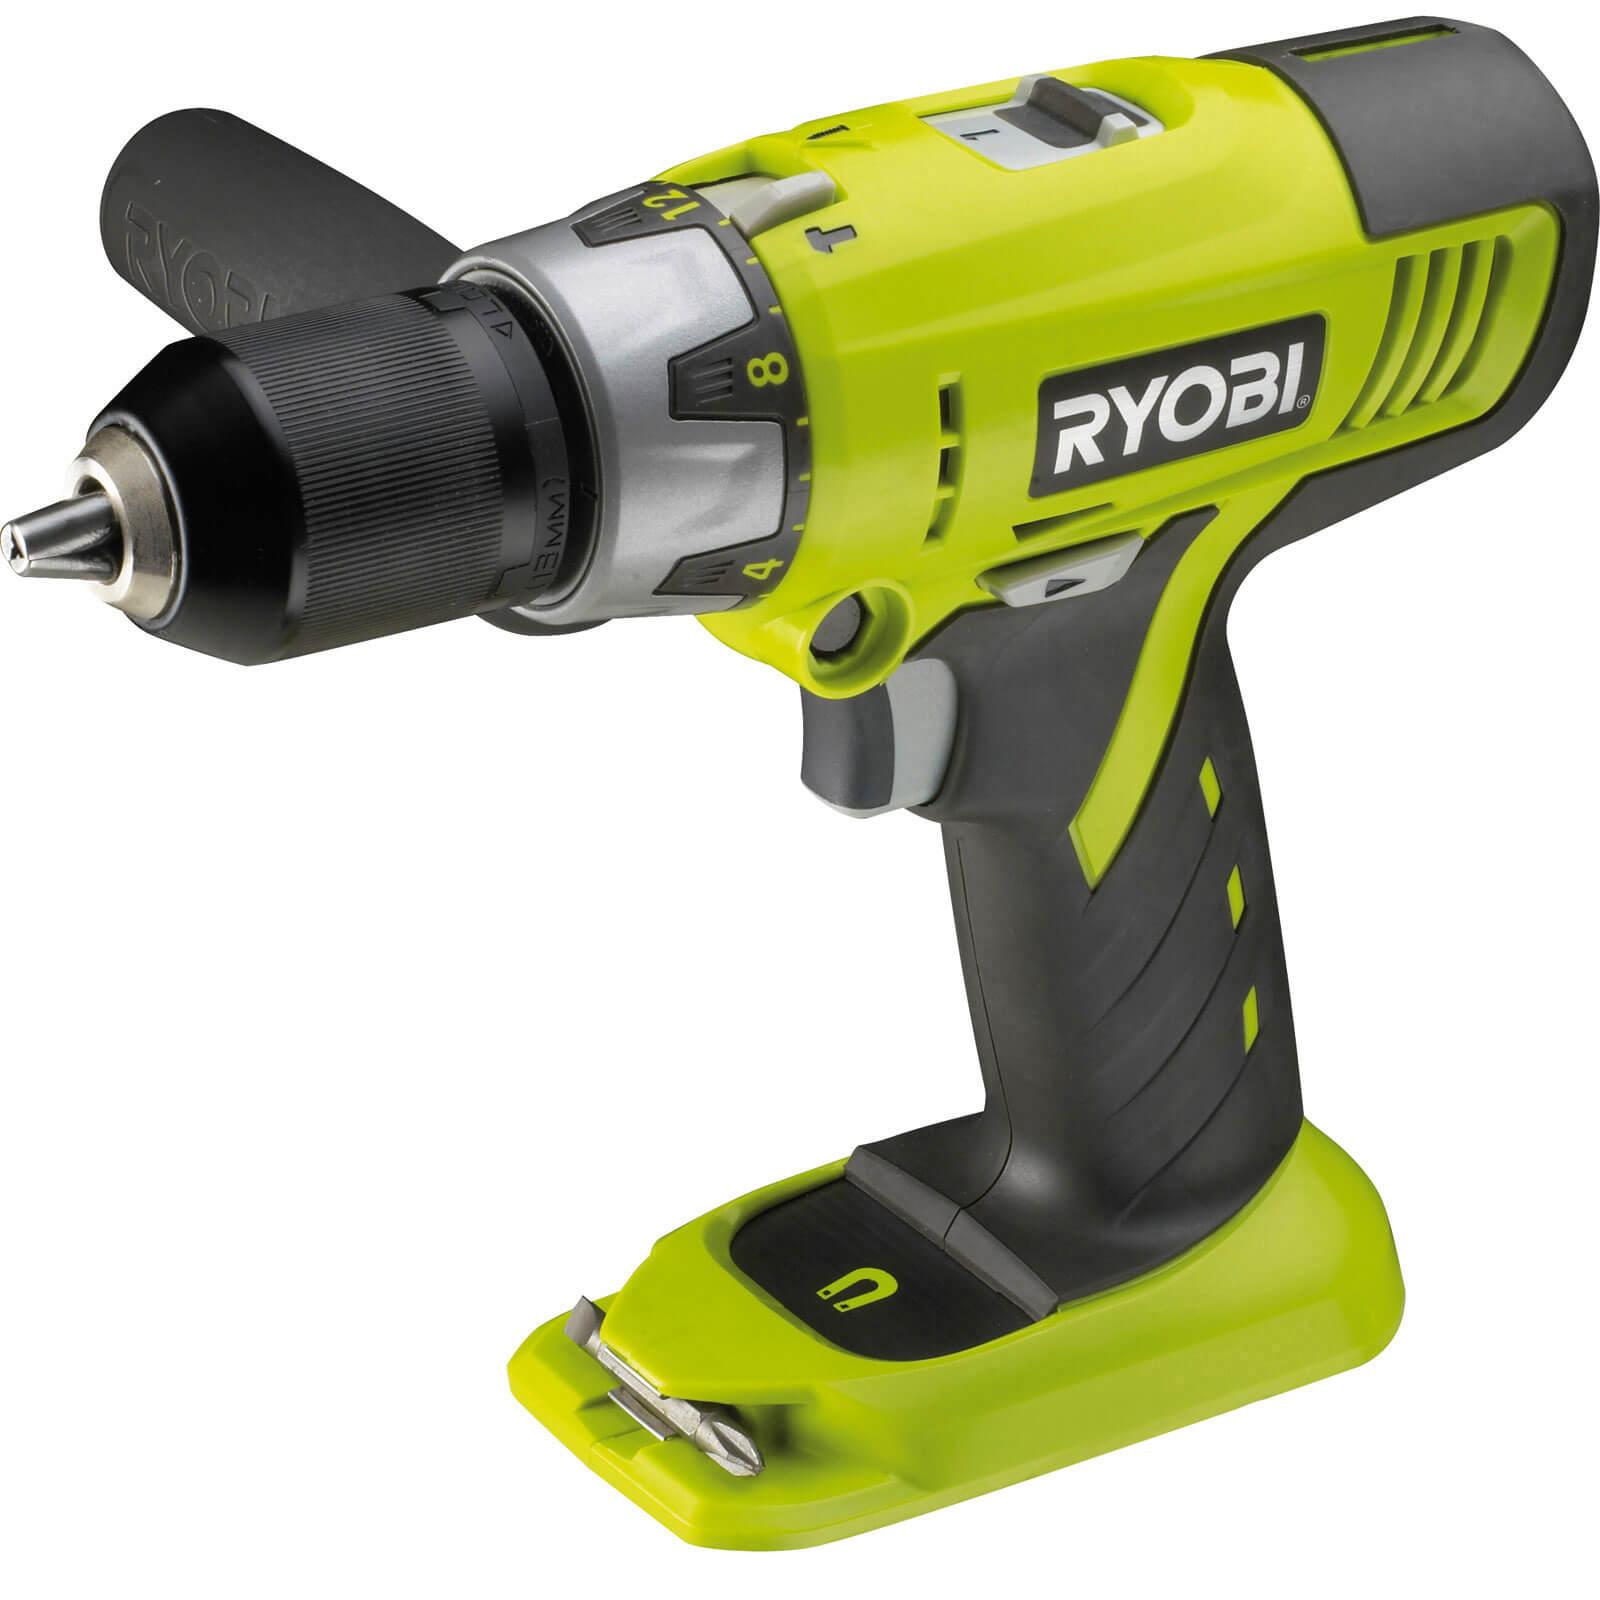 Ryobi LCDI1802M 18v Cordless Combi Drill No Batteries No Charger No Case